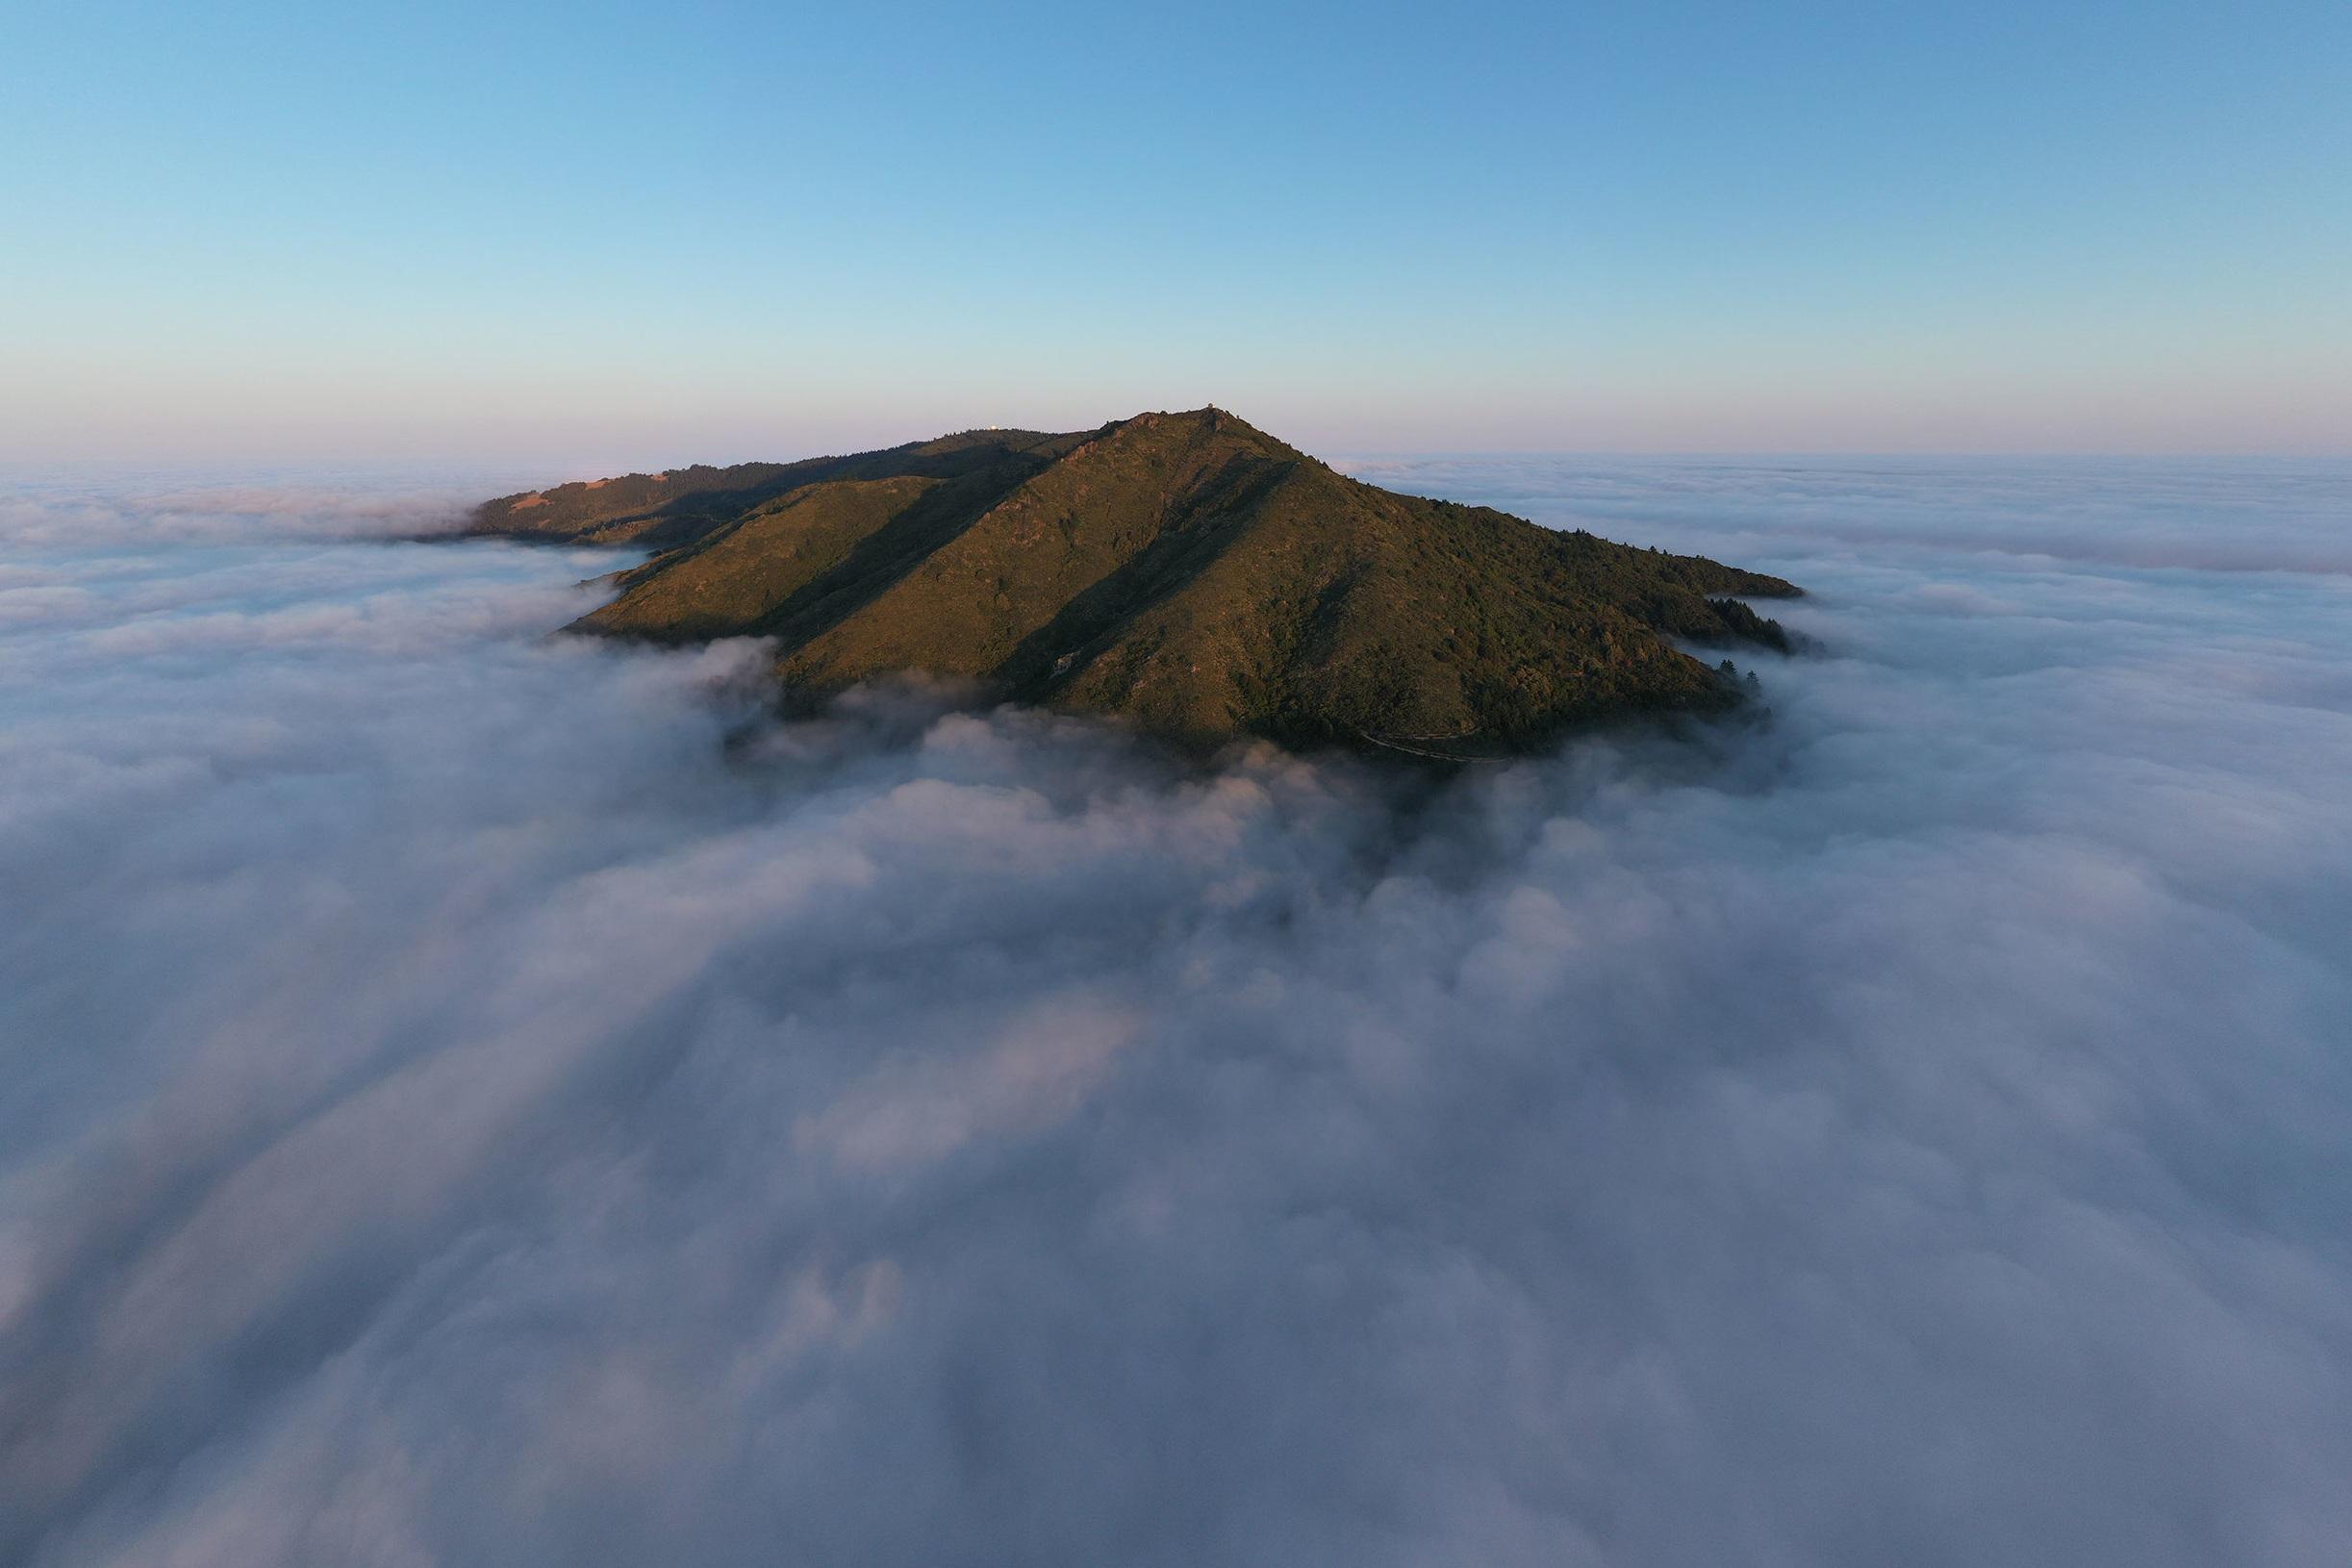 Aerial View, Mount. Tamalpais - CA